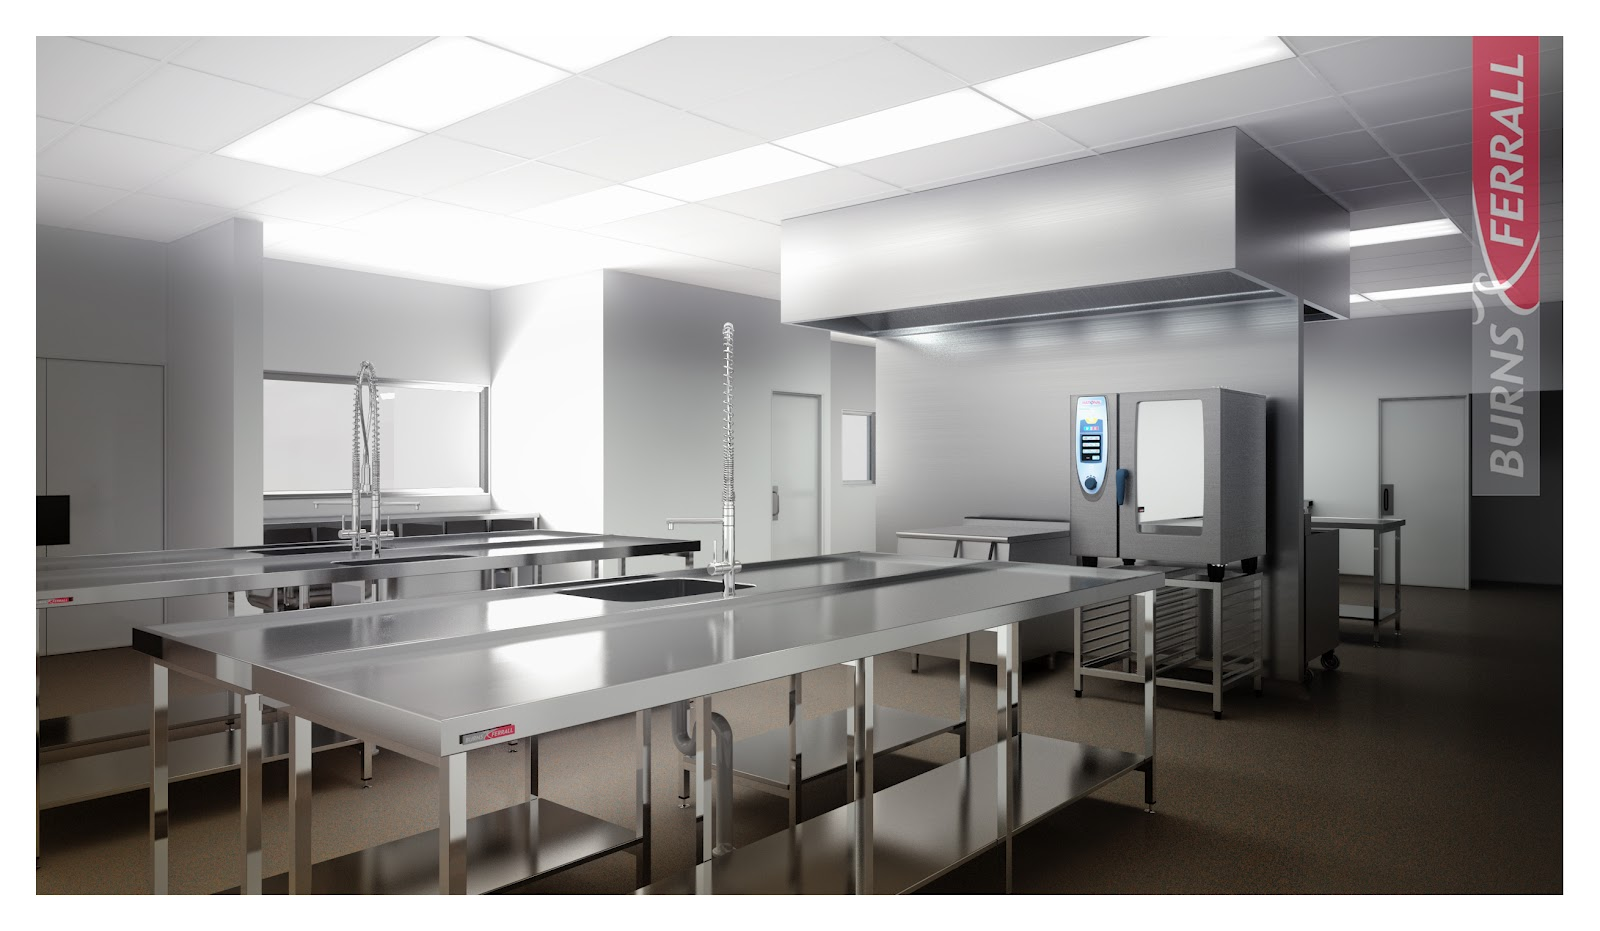 Commercial Kitchen Design Marae